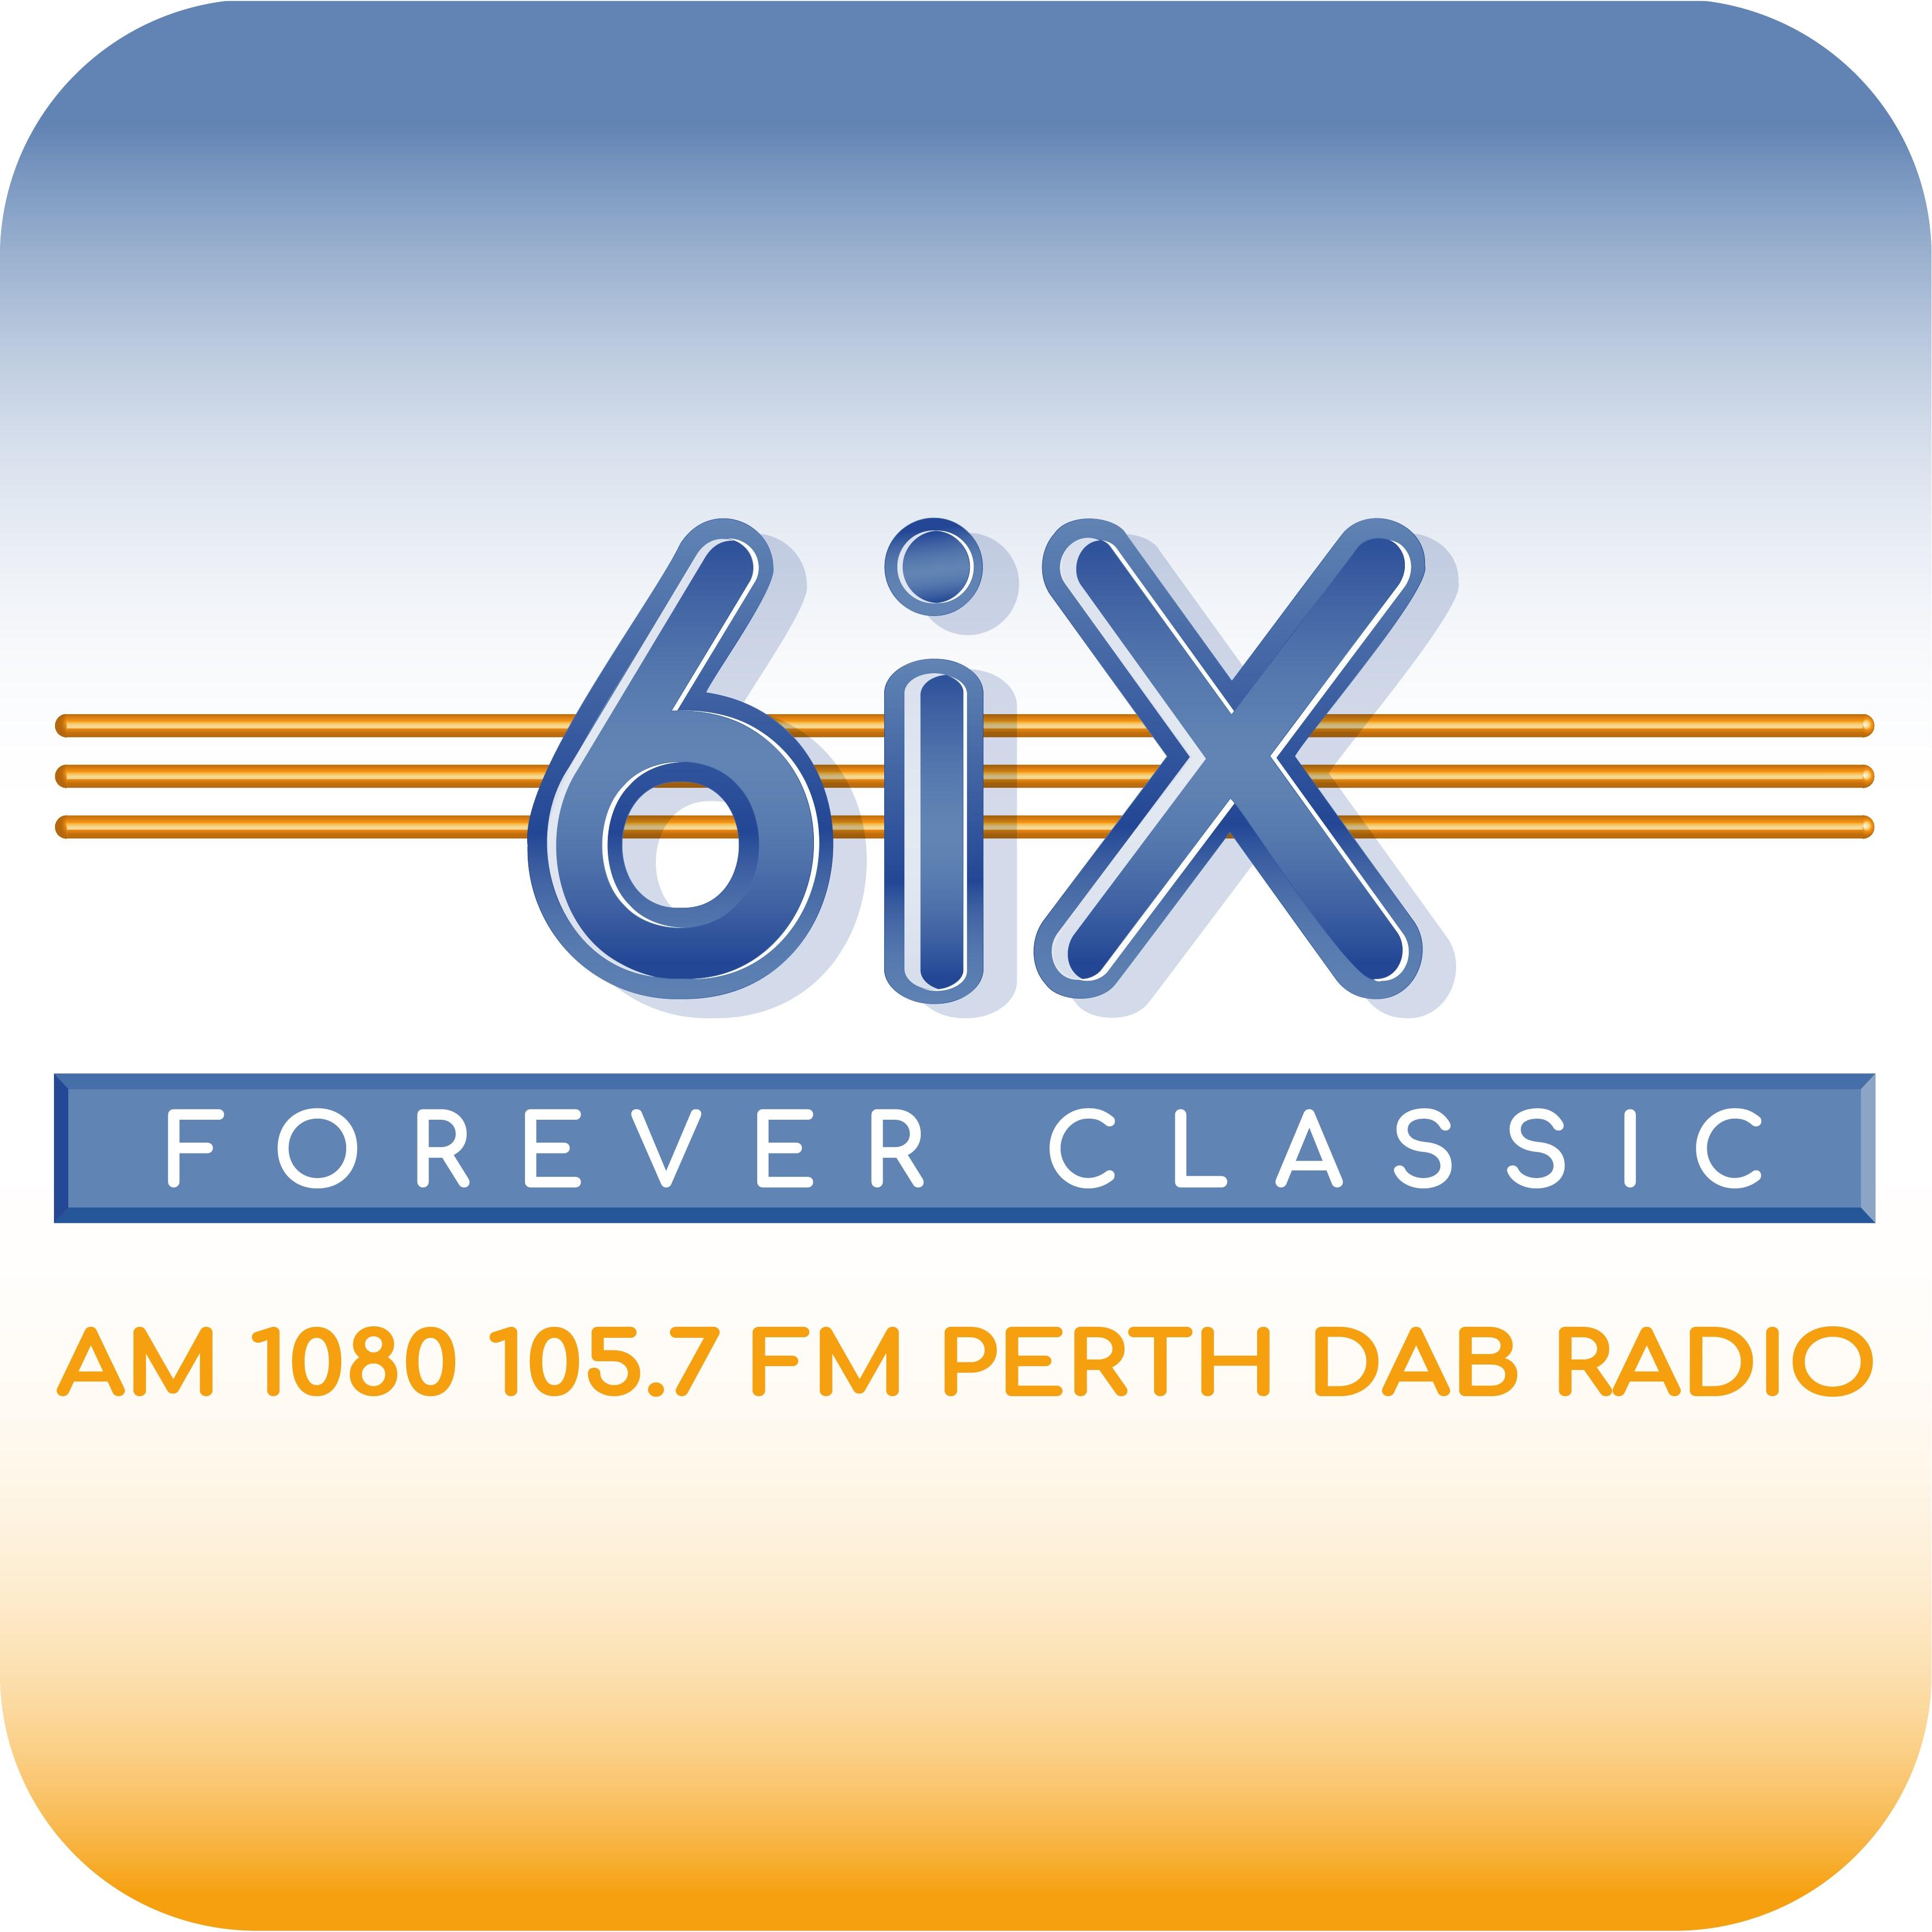 6ix Radio